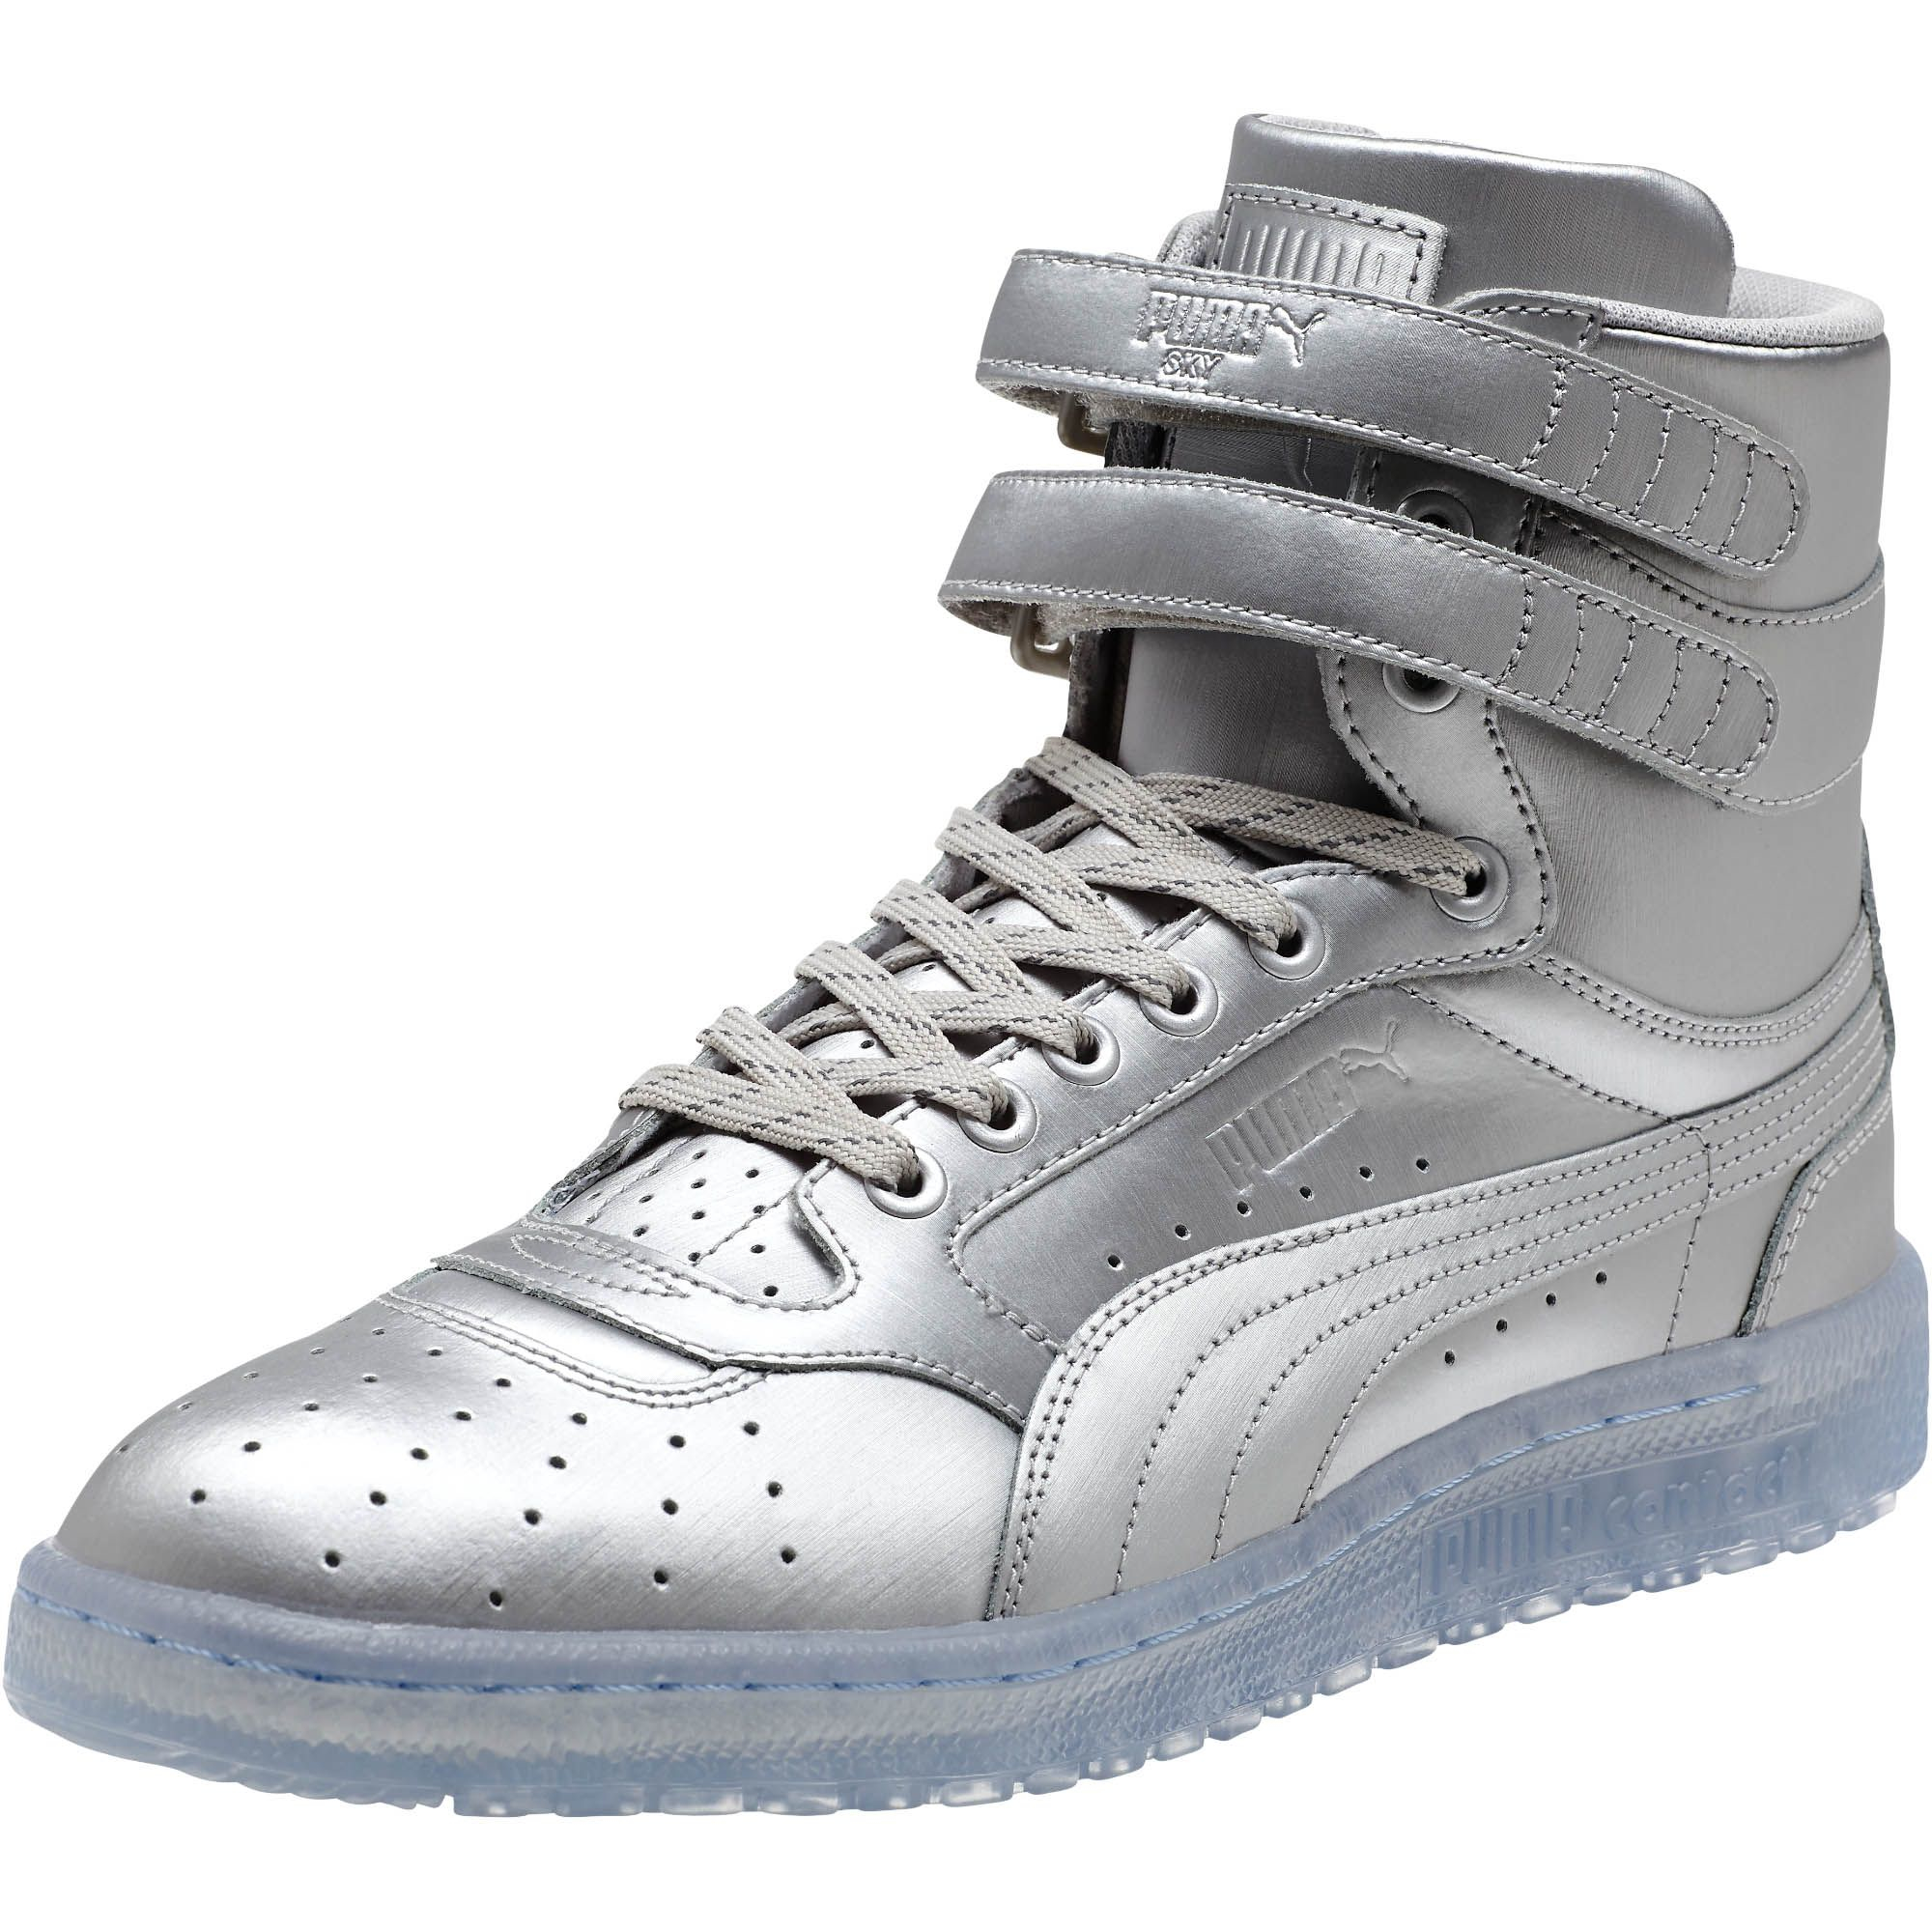 Lyst - PUMA Sky Ii Hi Platinum Men s Sneakers in Metallic for Men d8ba72a083cd